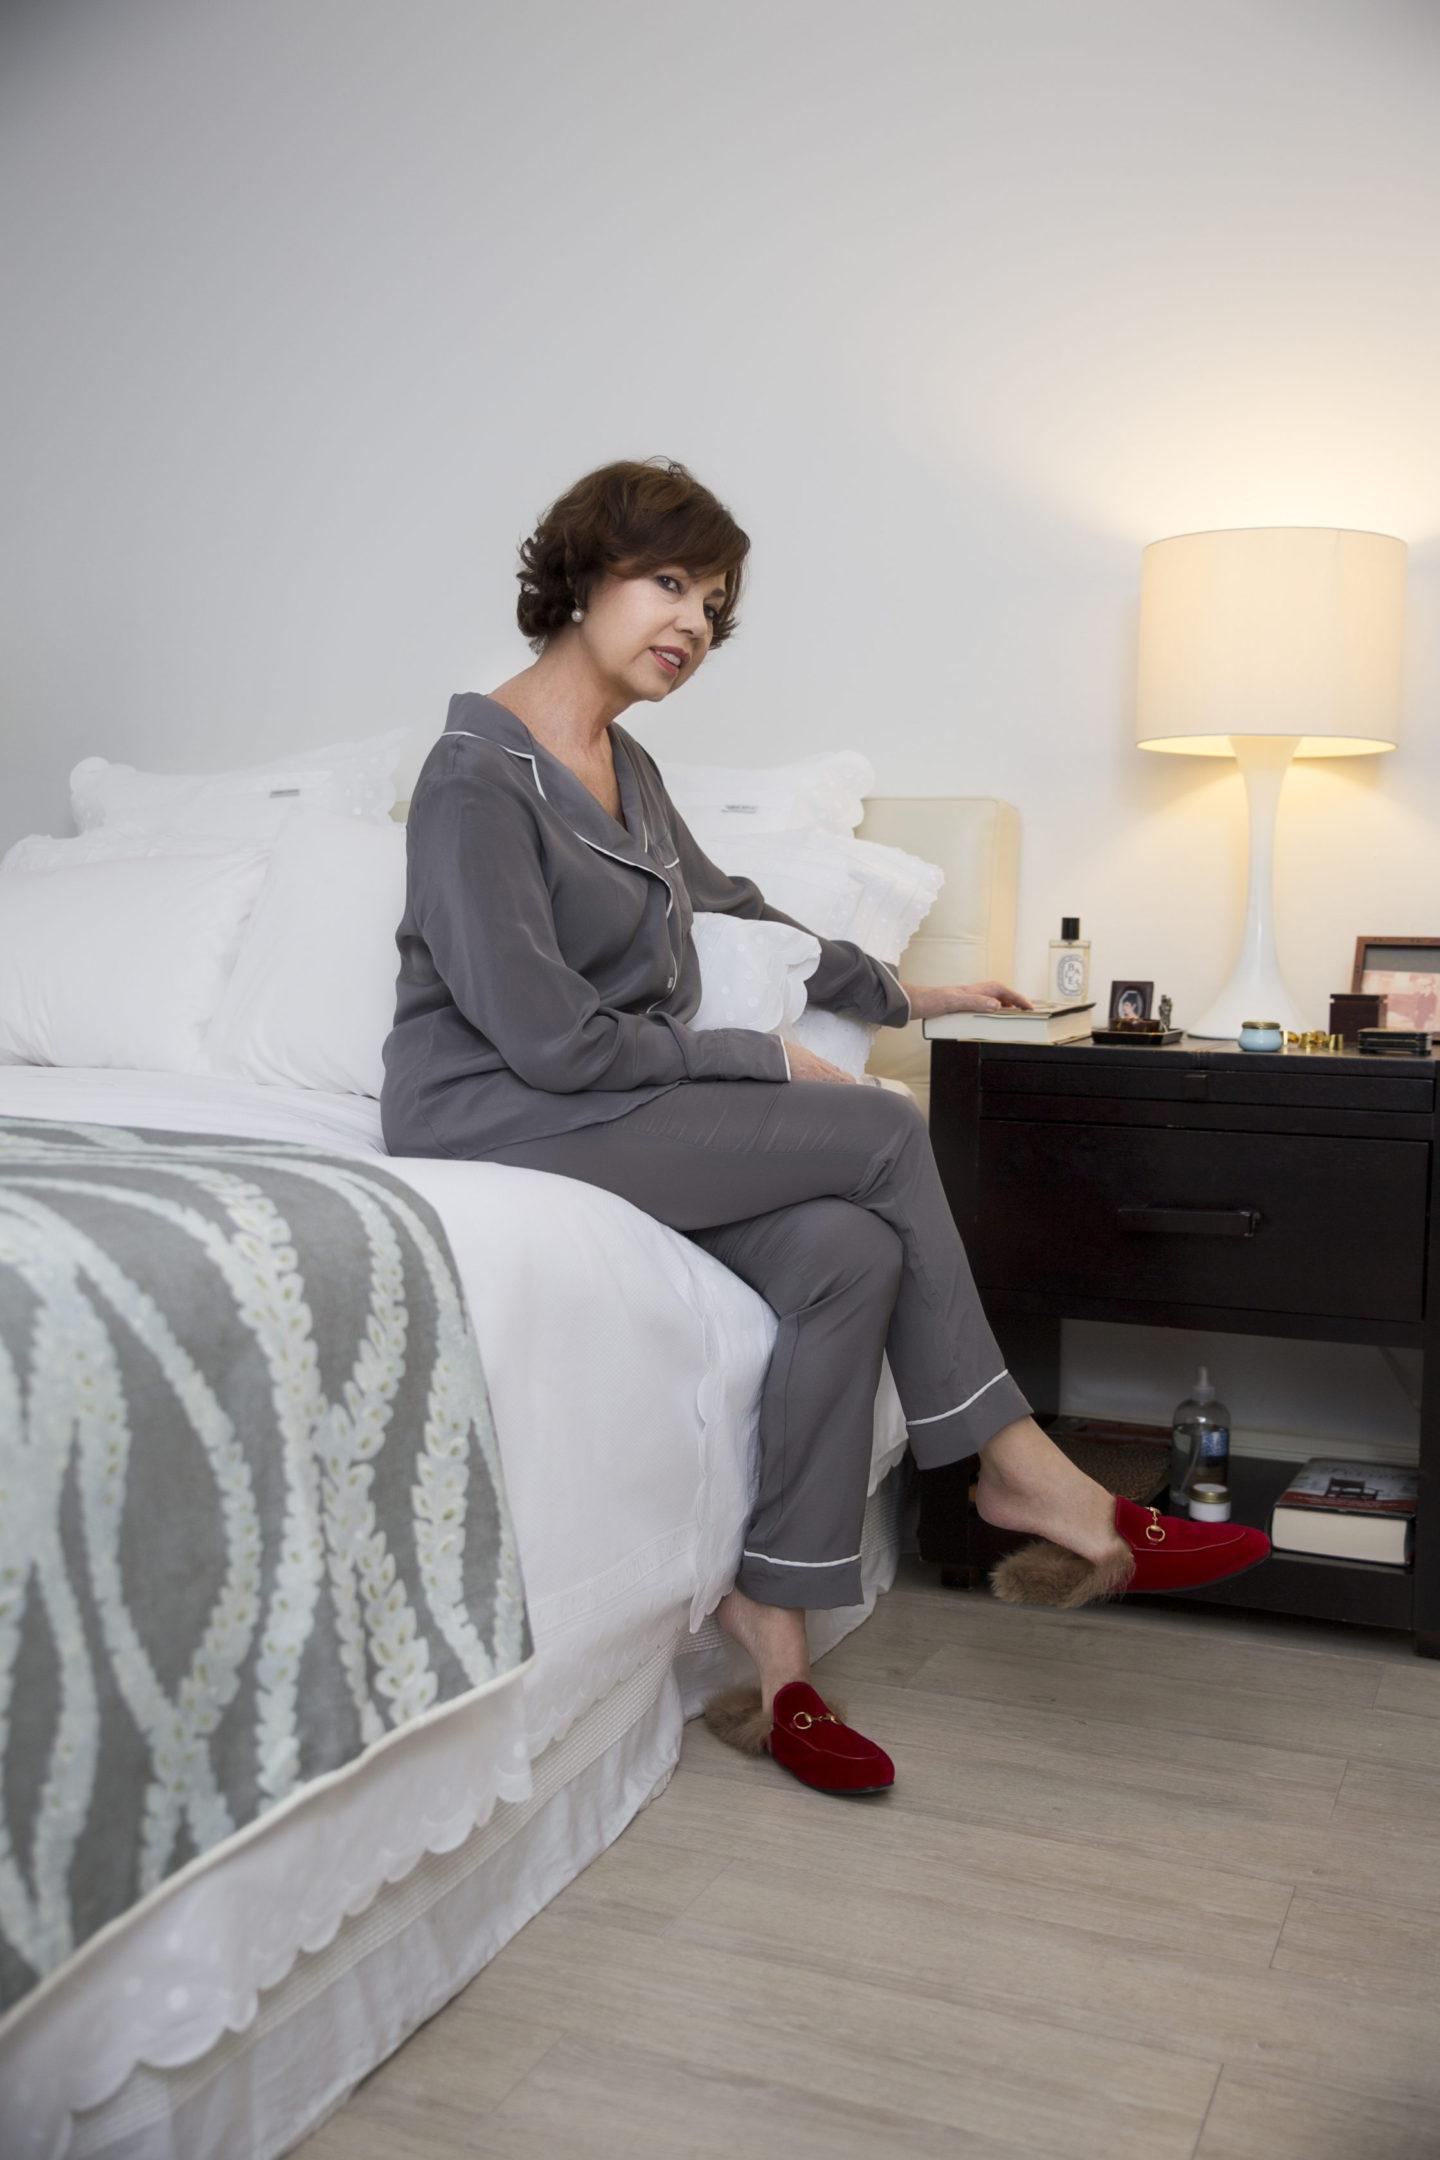 miami-based-blogger-sitting-in-her-bed-carmen-borja-linens